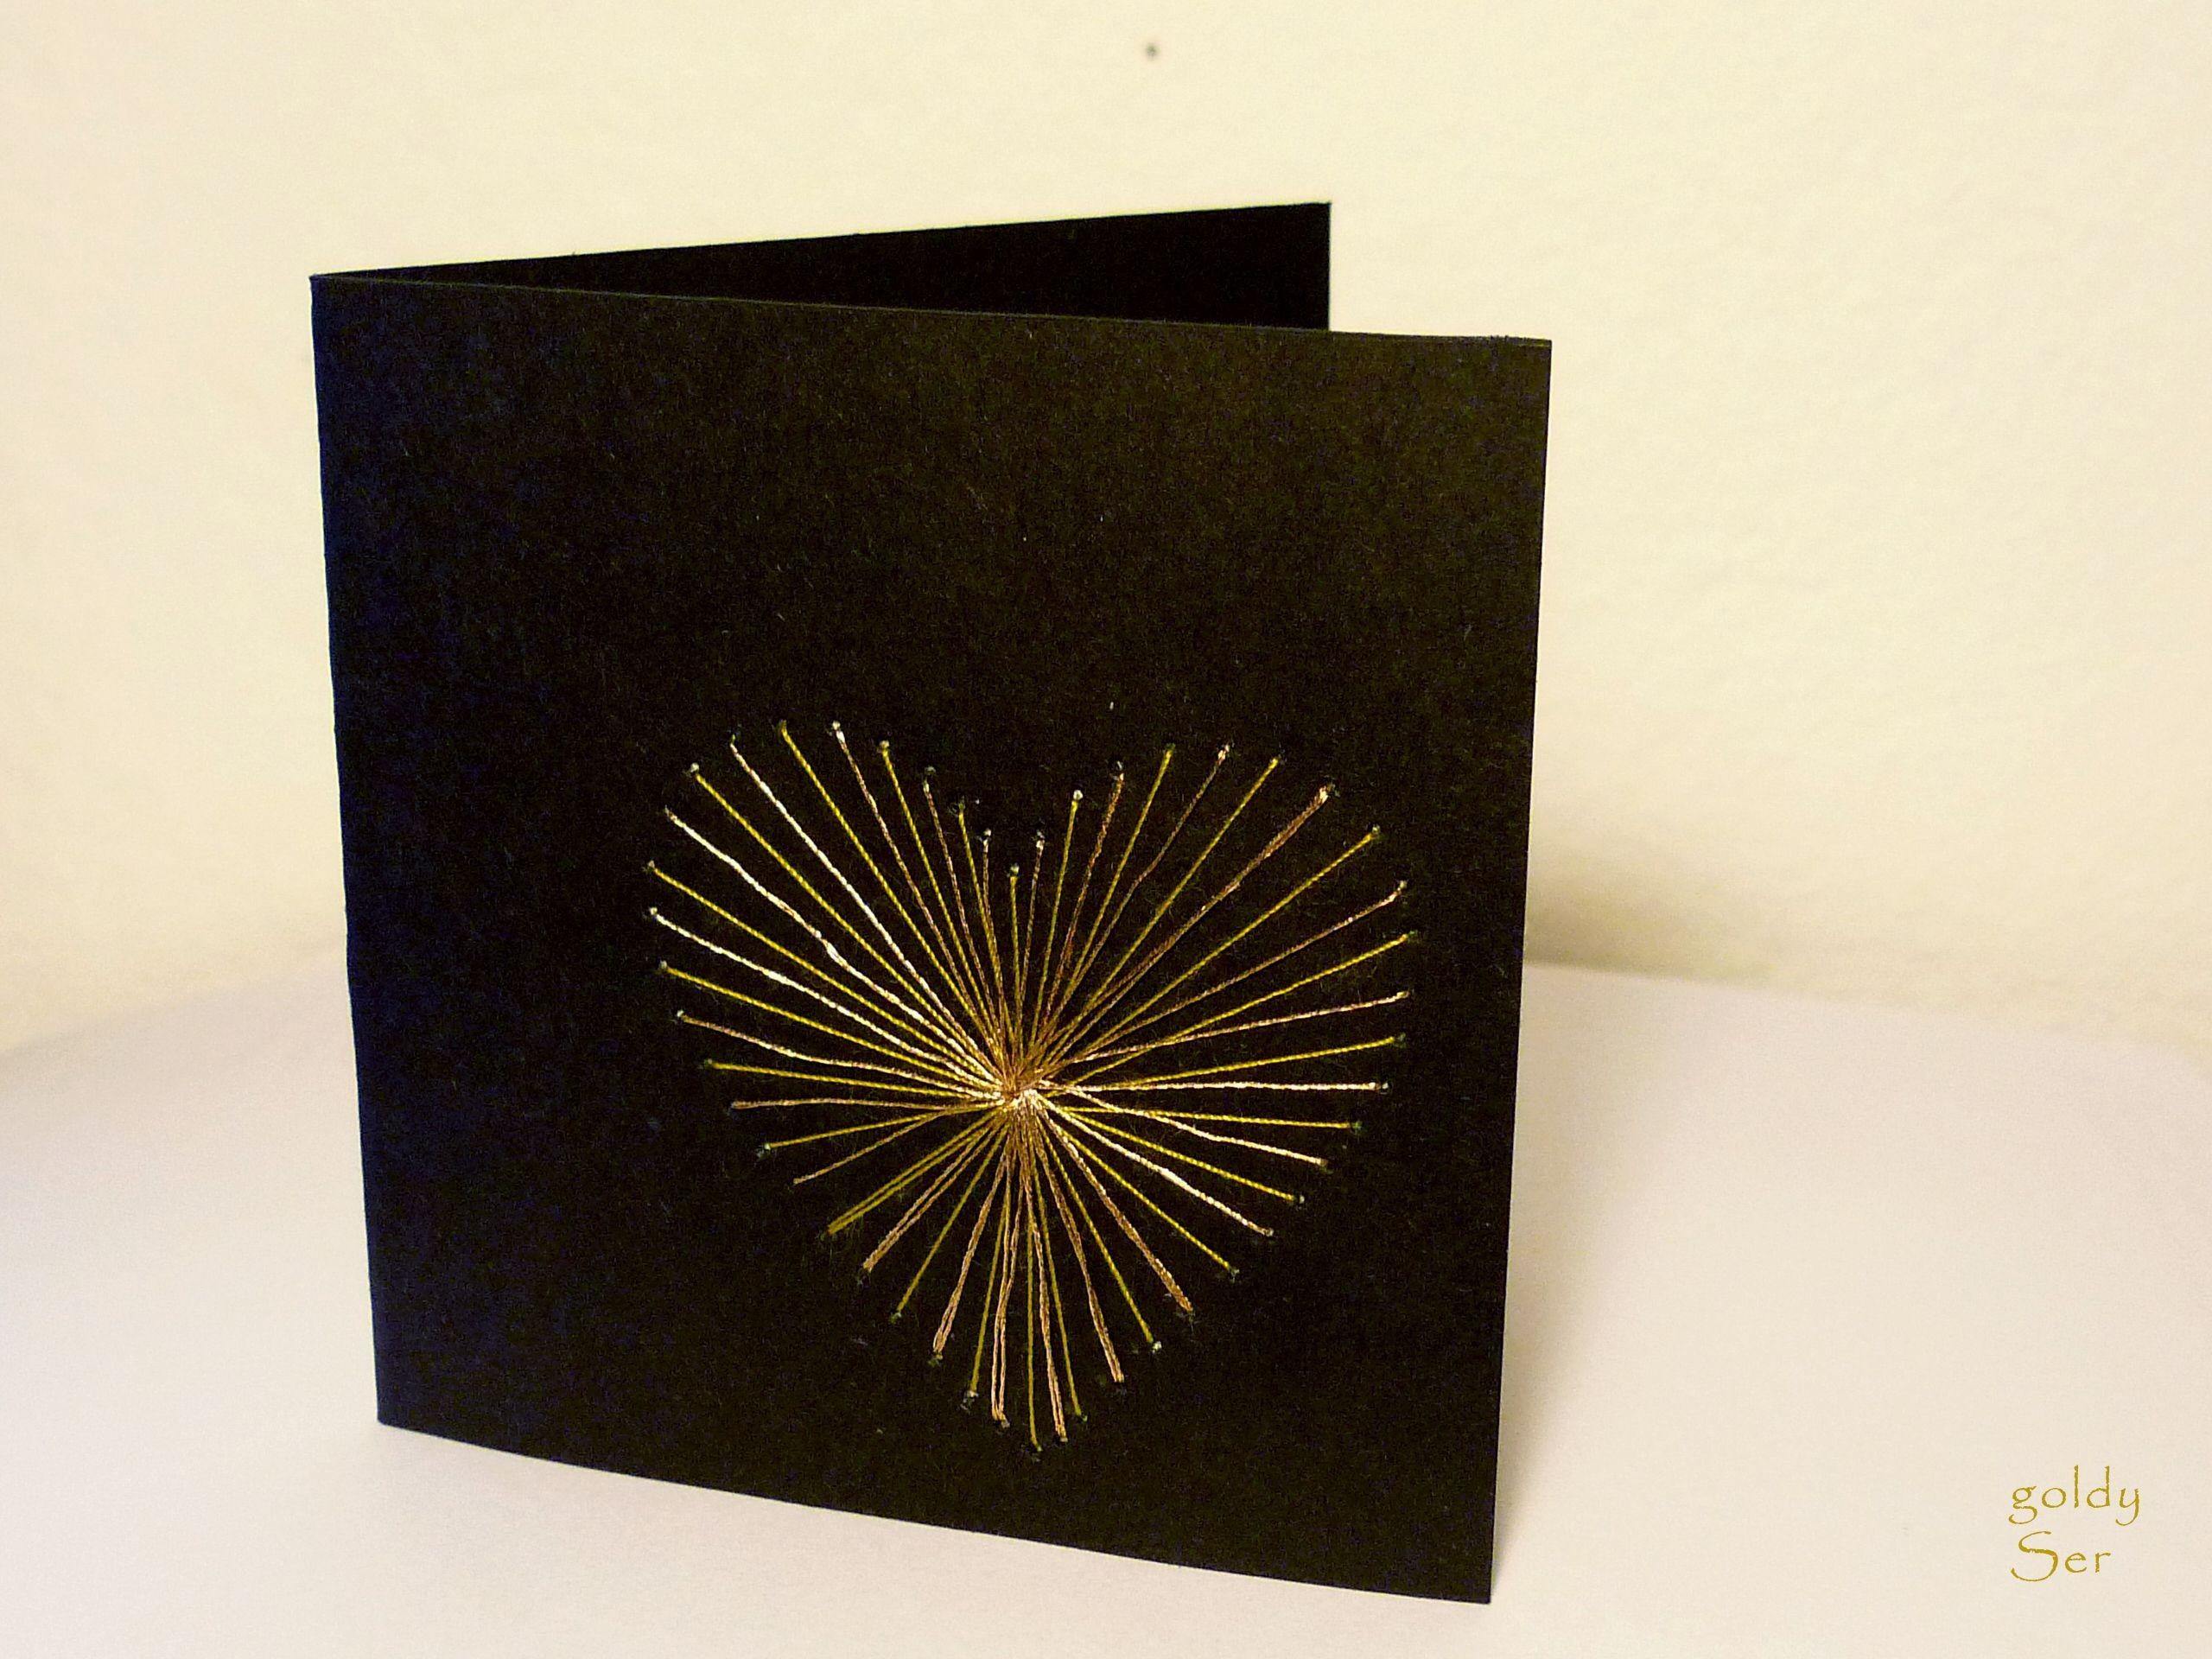 Stitch Papercraft Stitched Card Black Paper Gold Thread Pinbroidery